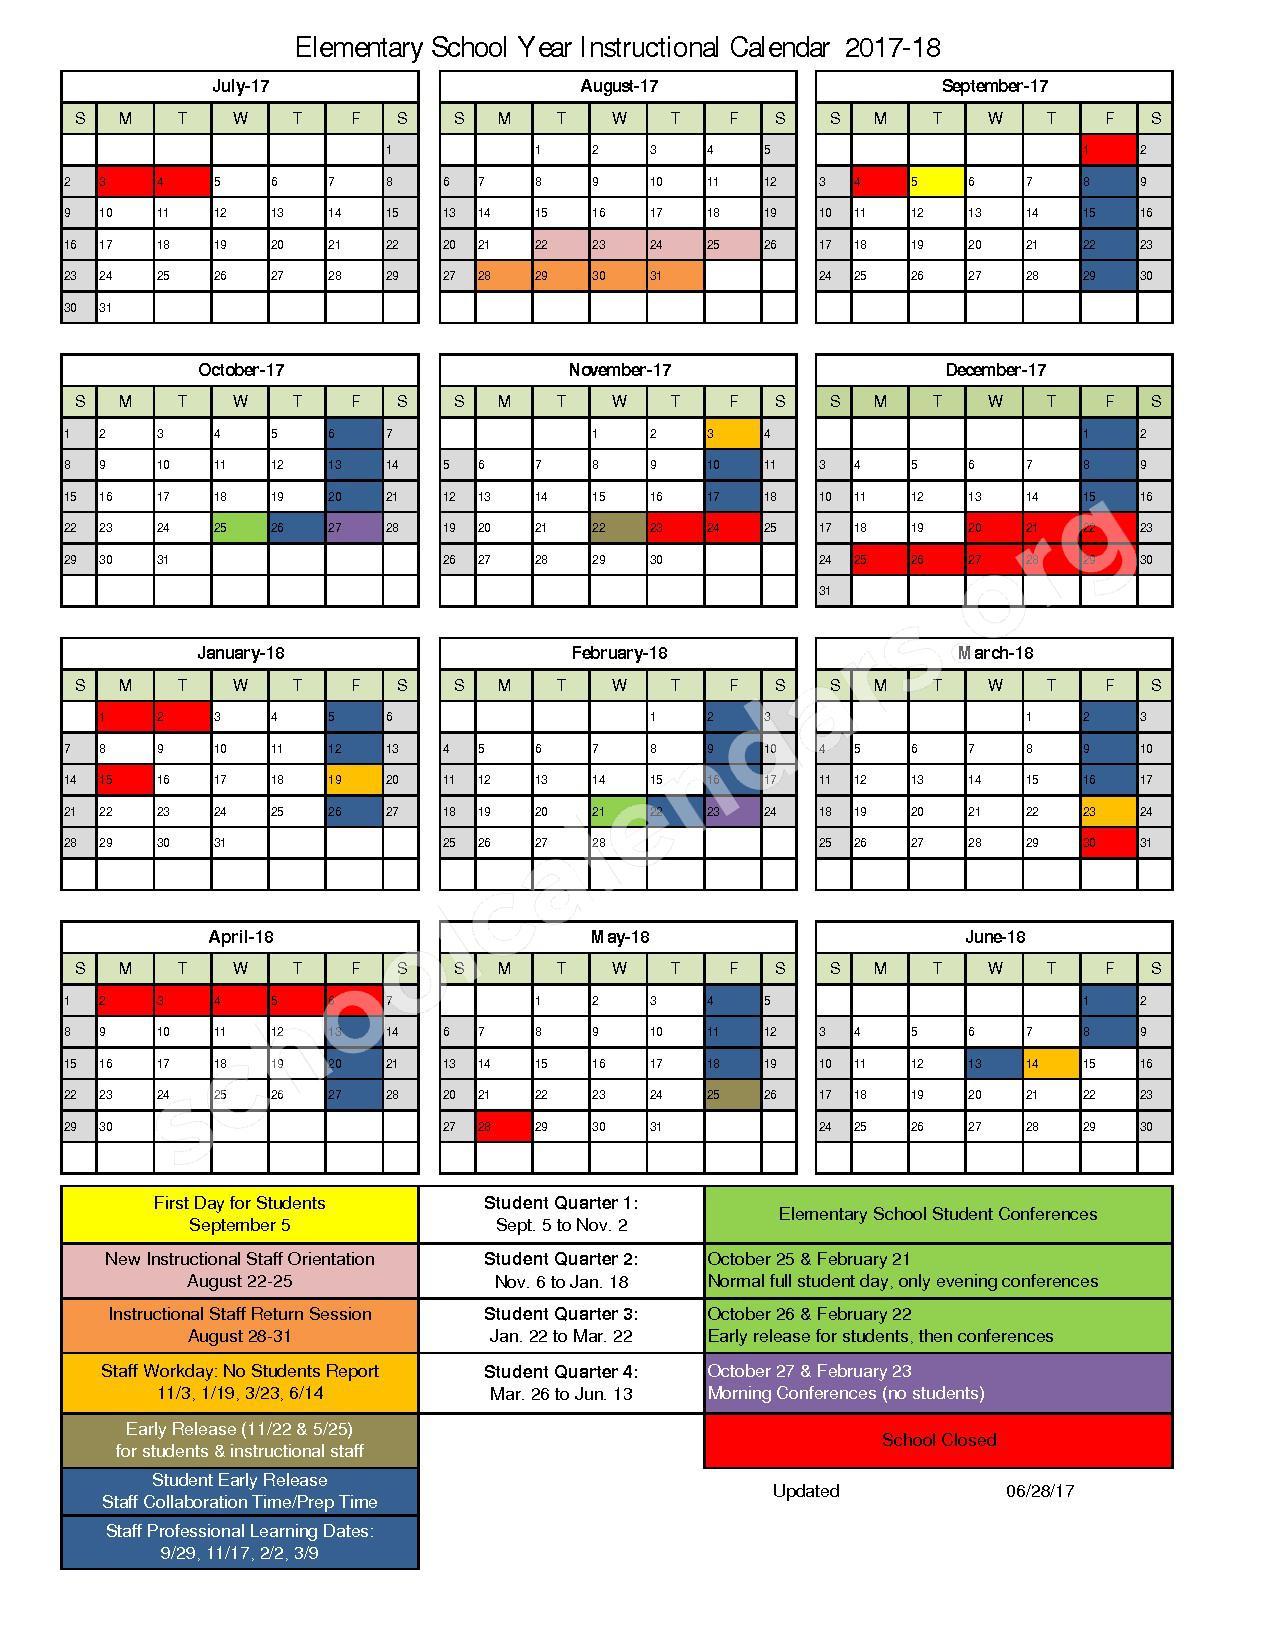 2017 - 2018 Elementary School Instructional Calendar – Kenosha School District – page 1